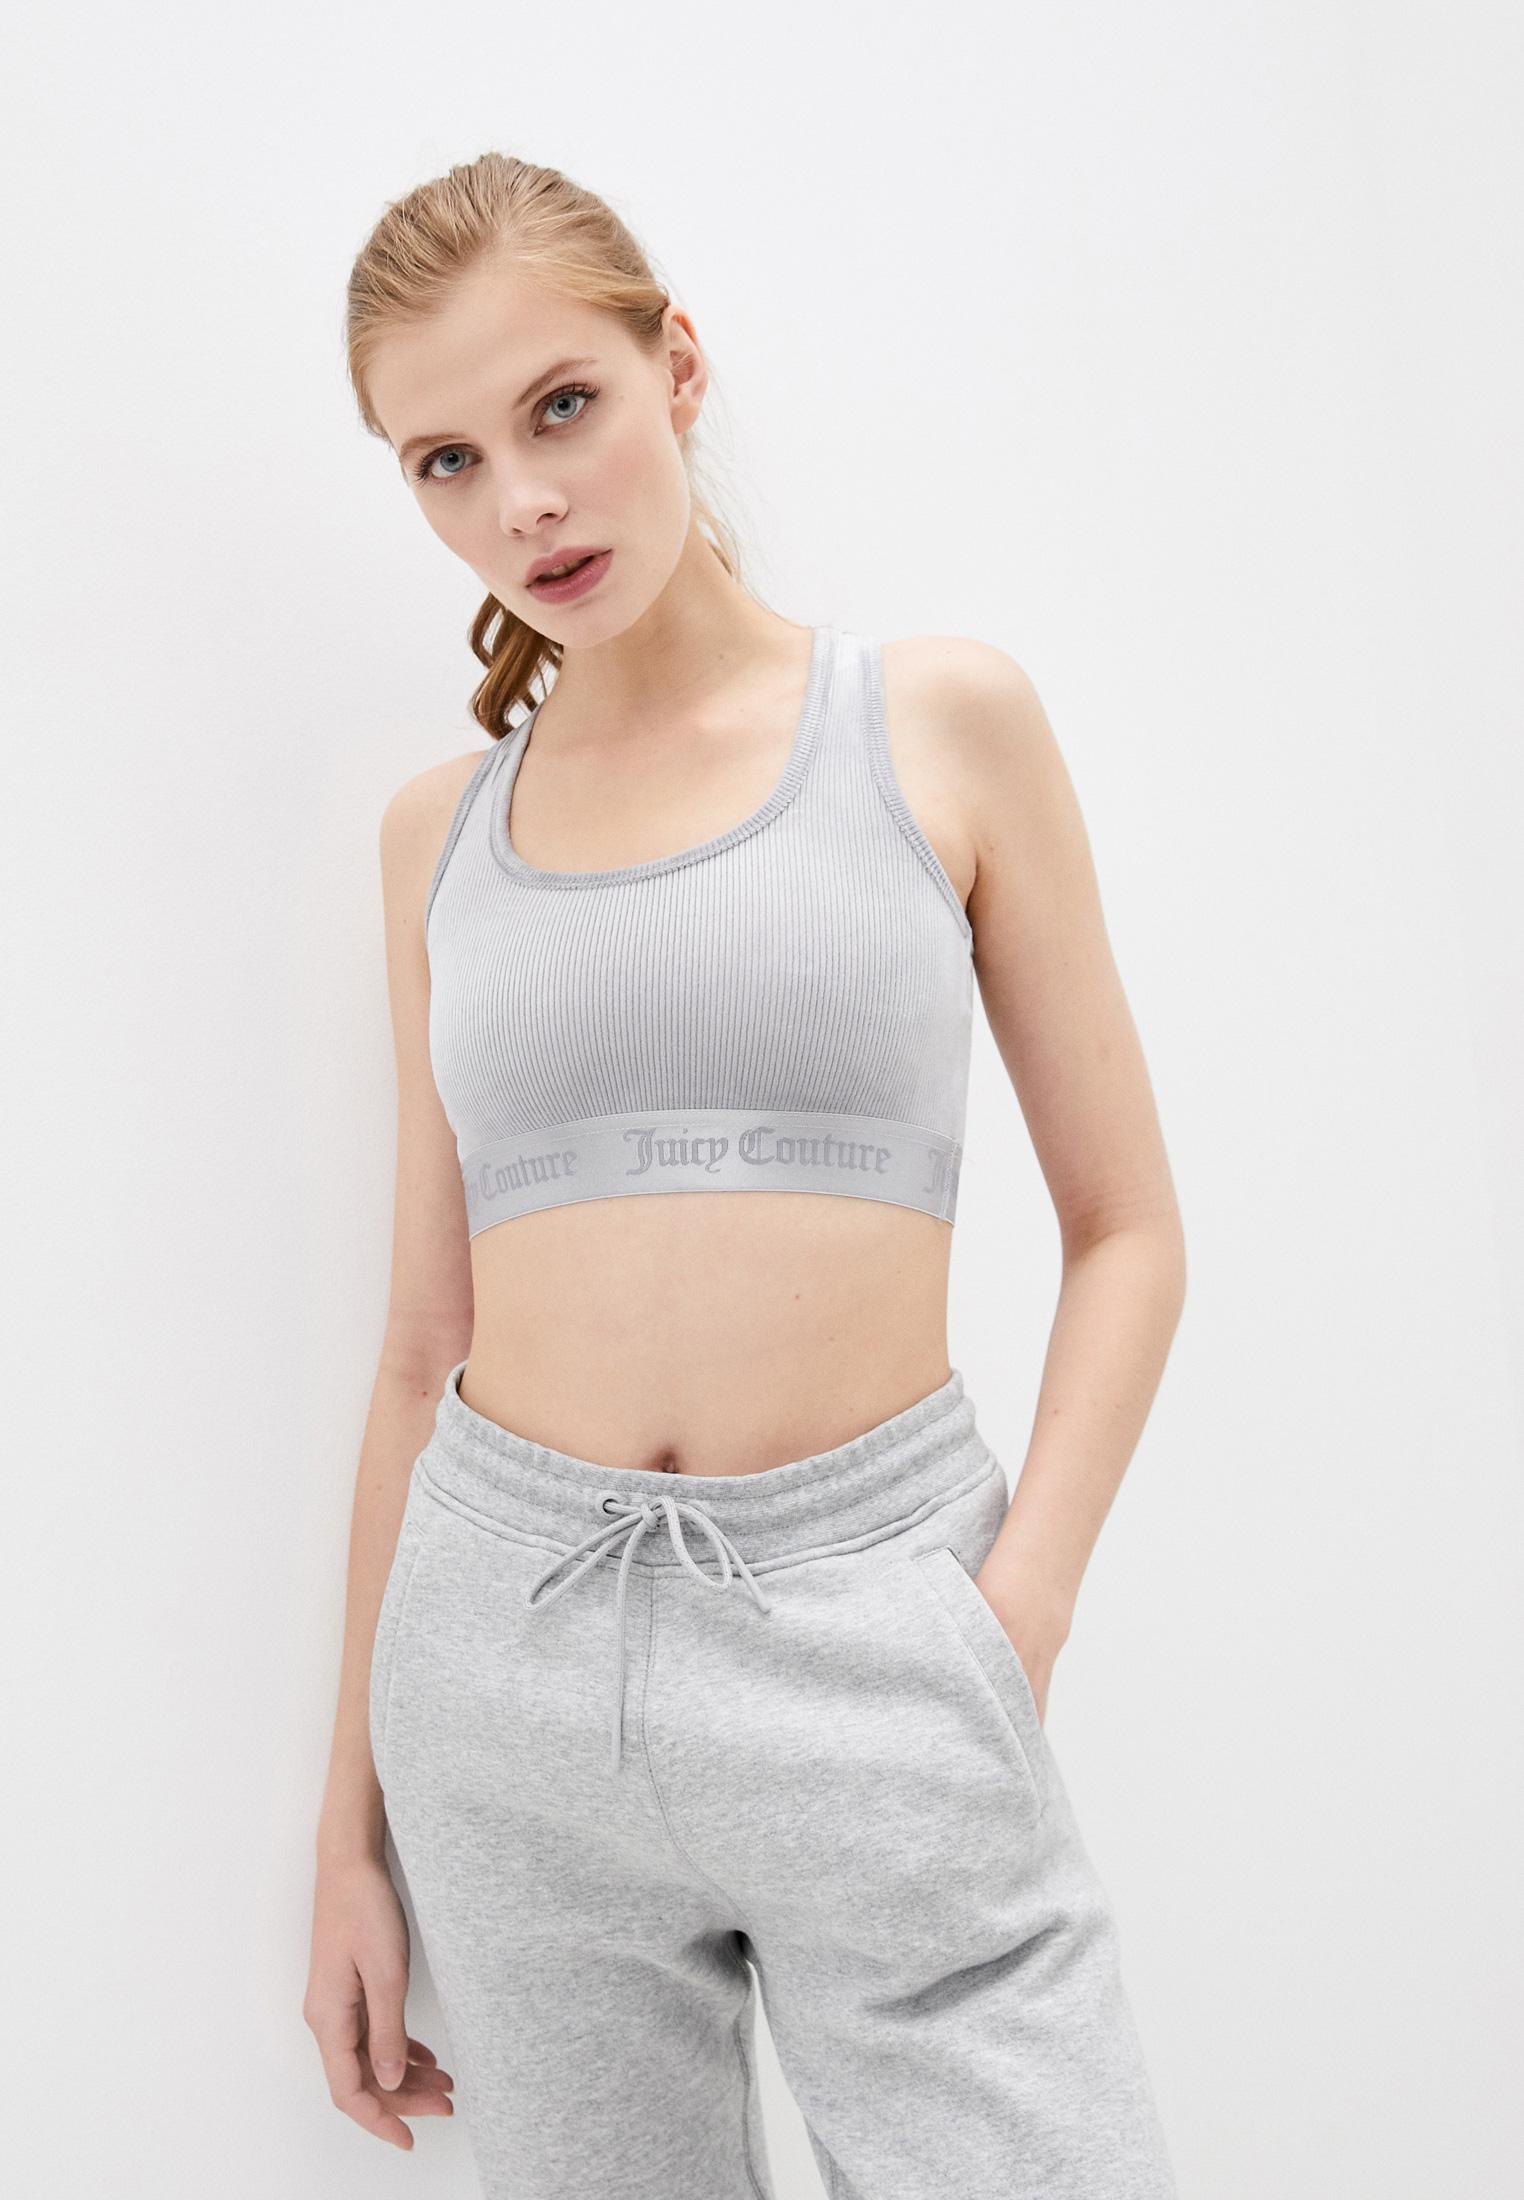 Топ спортивный Juicy Couture GILLIAN за 4 890 ₽. в интернет-магазине Lamoda.ru